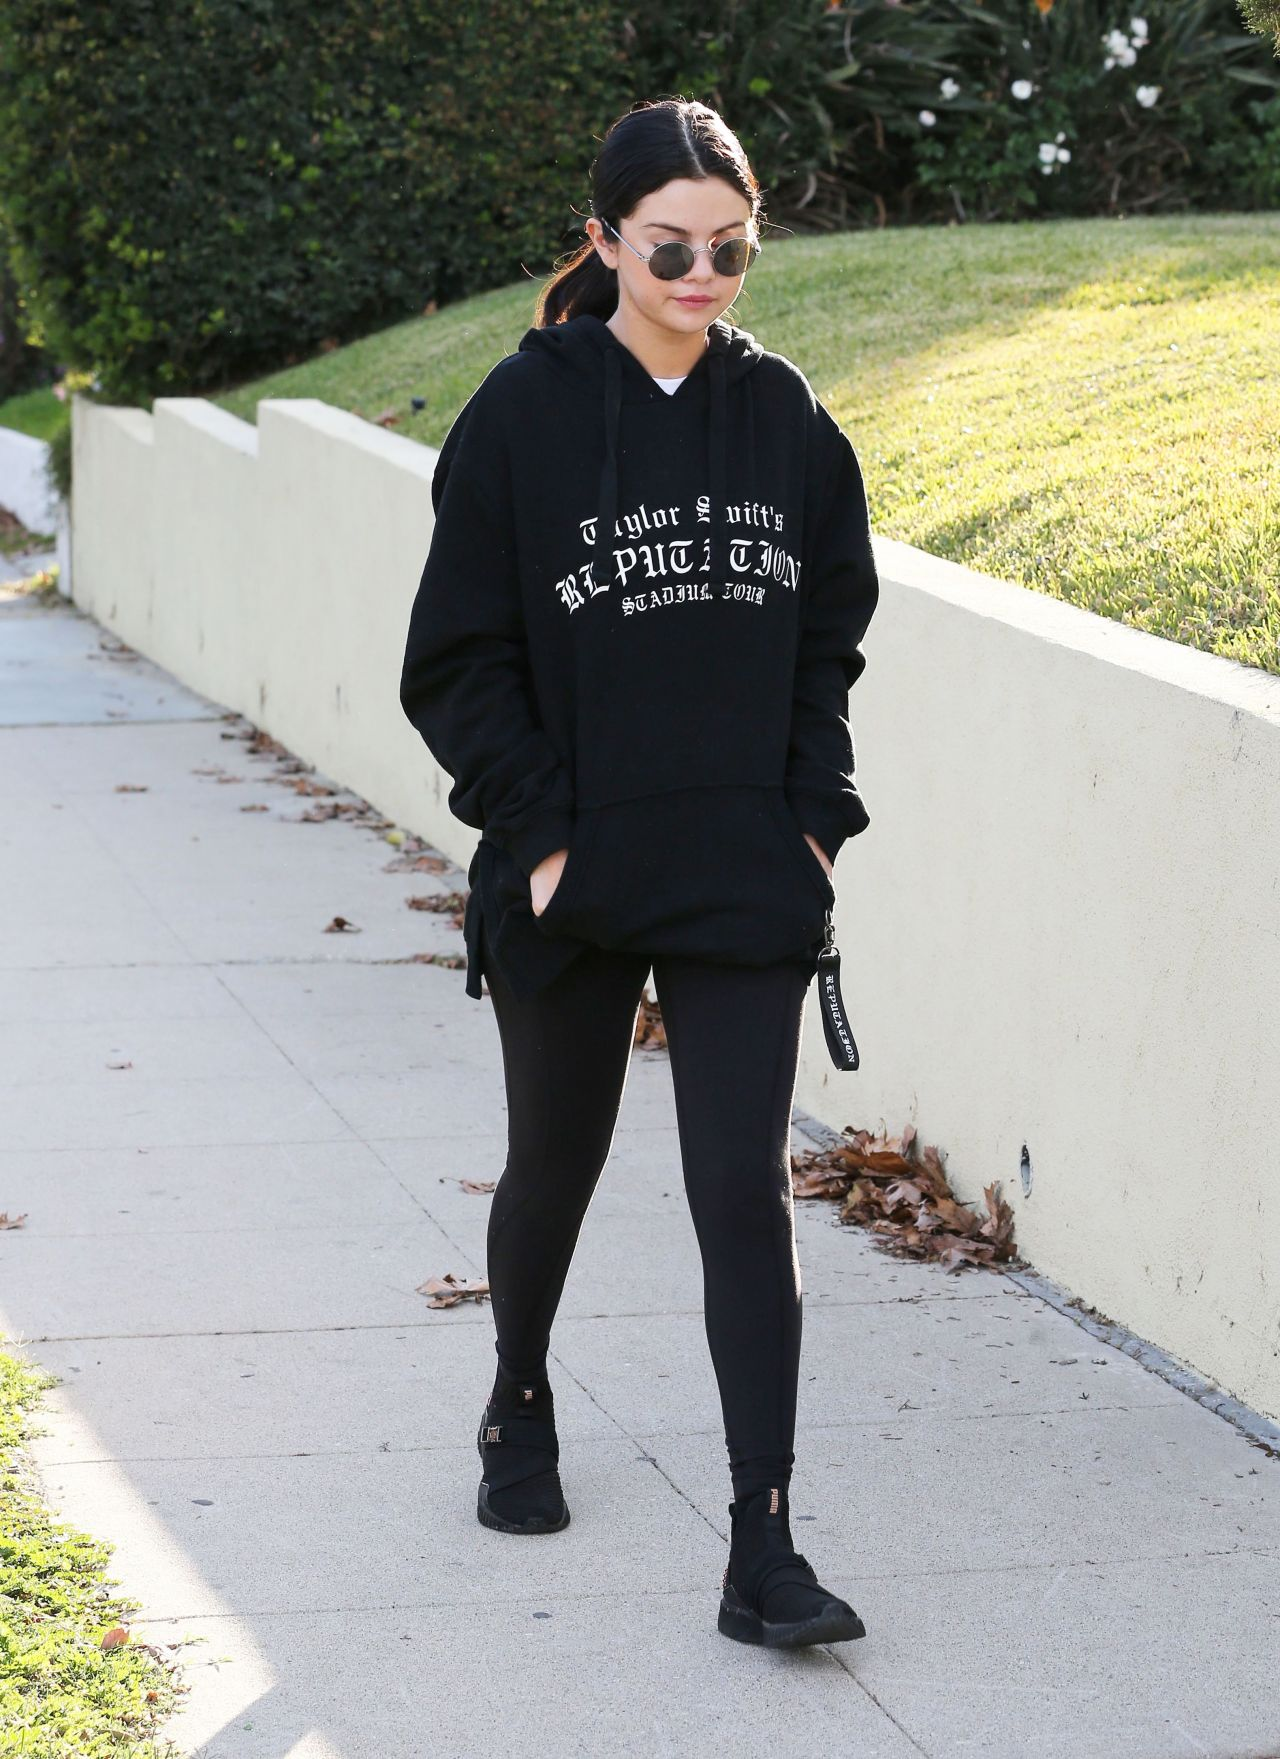 f5f3b7dd711a Selena Gomez in Taylor Swift Hoodie and Black Leggings 12 26 2018